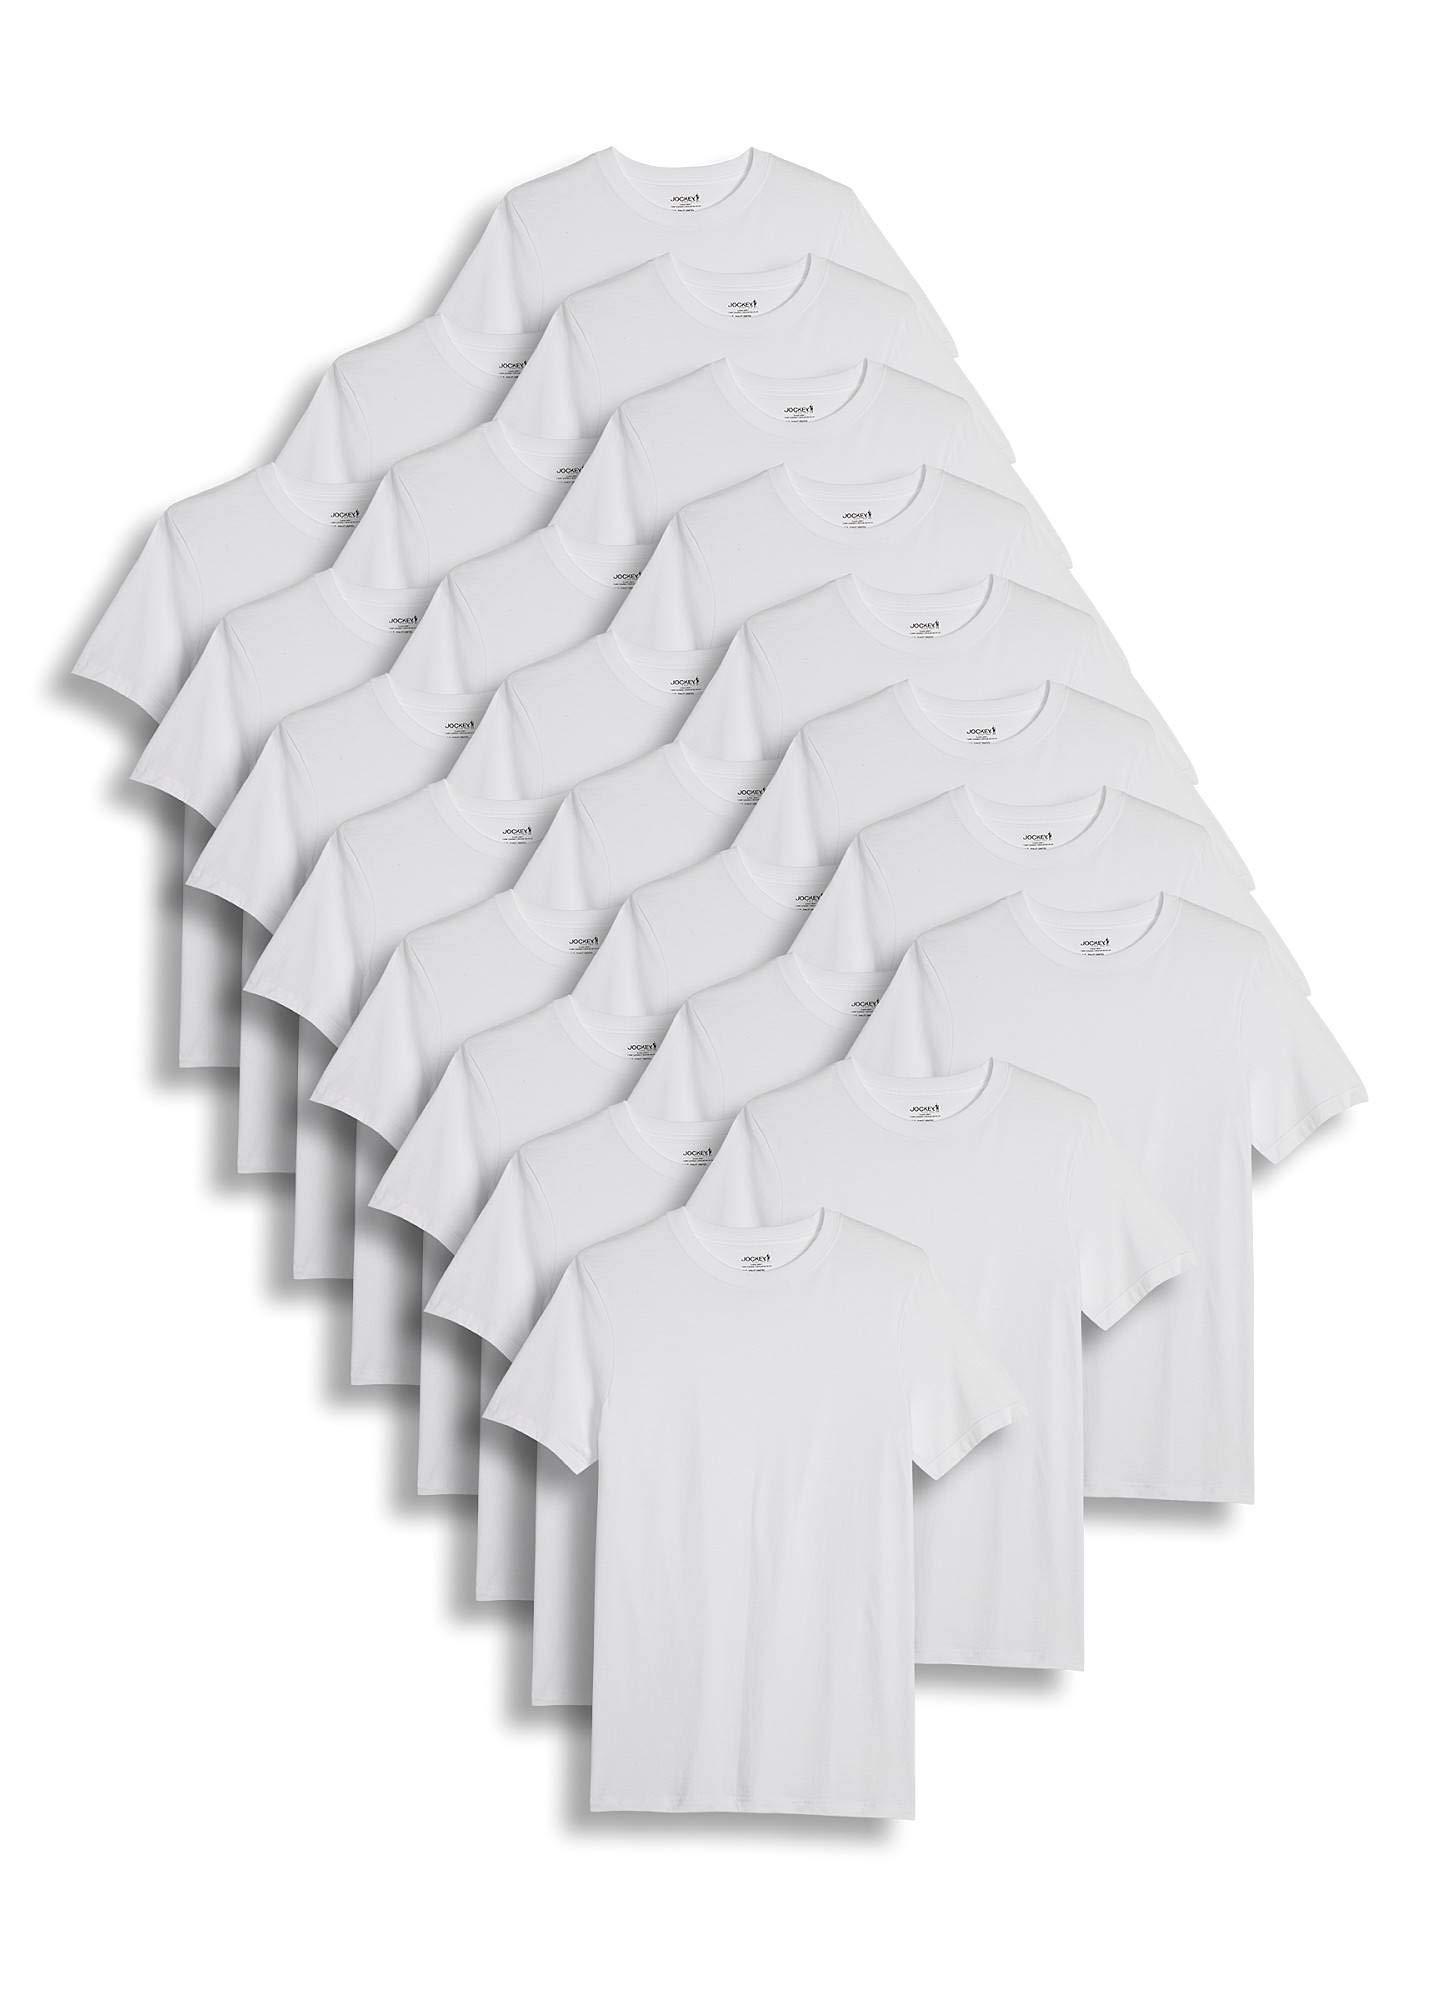 Jockey Men's T-Shirts Big & Tall Classic Crew Neck T-Shirt - 24 Pack, White, 4XL